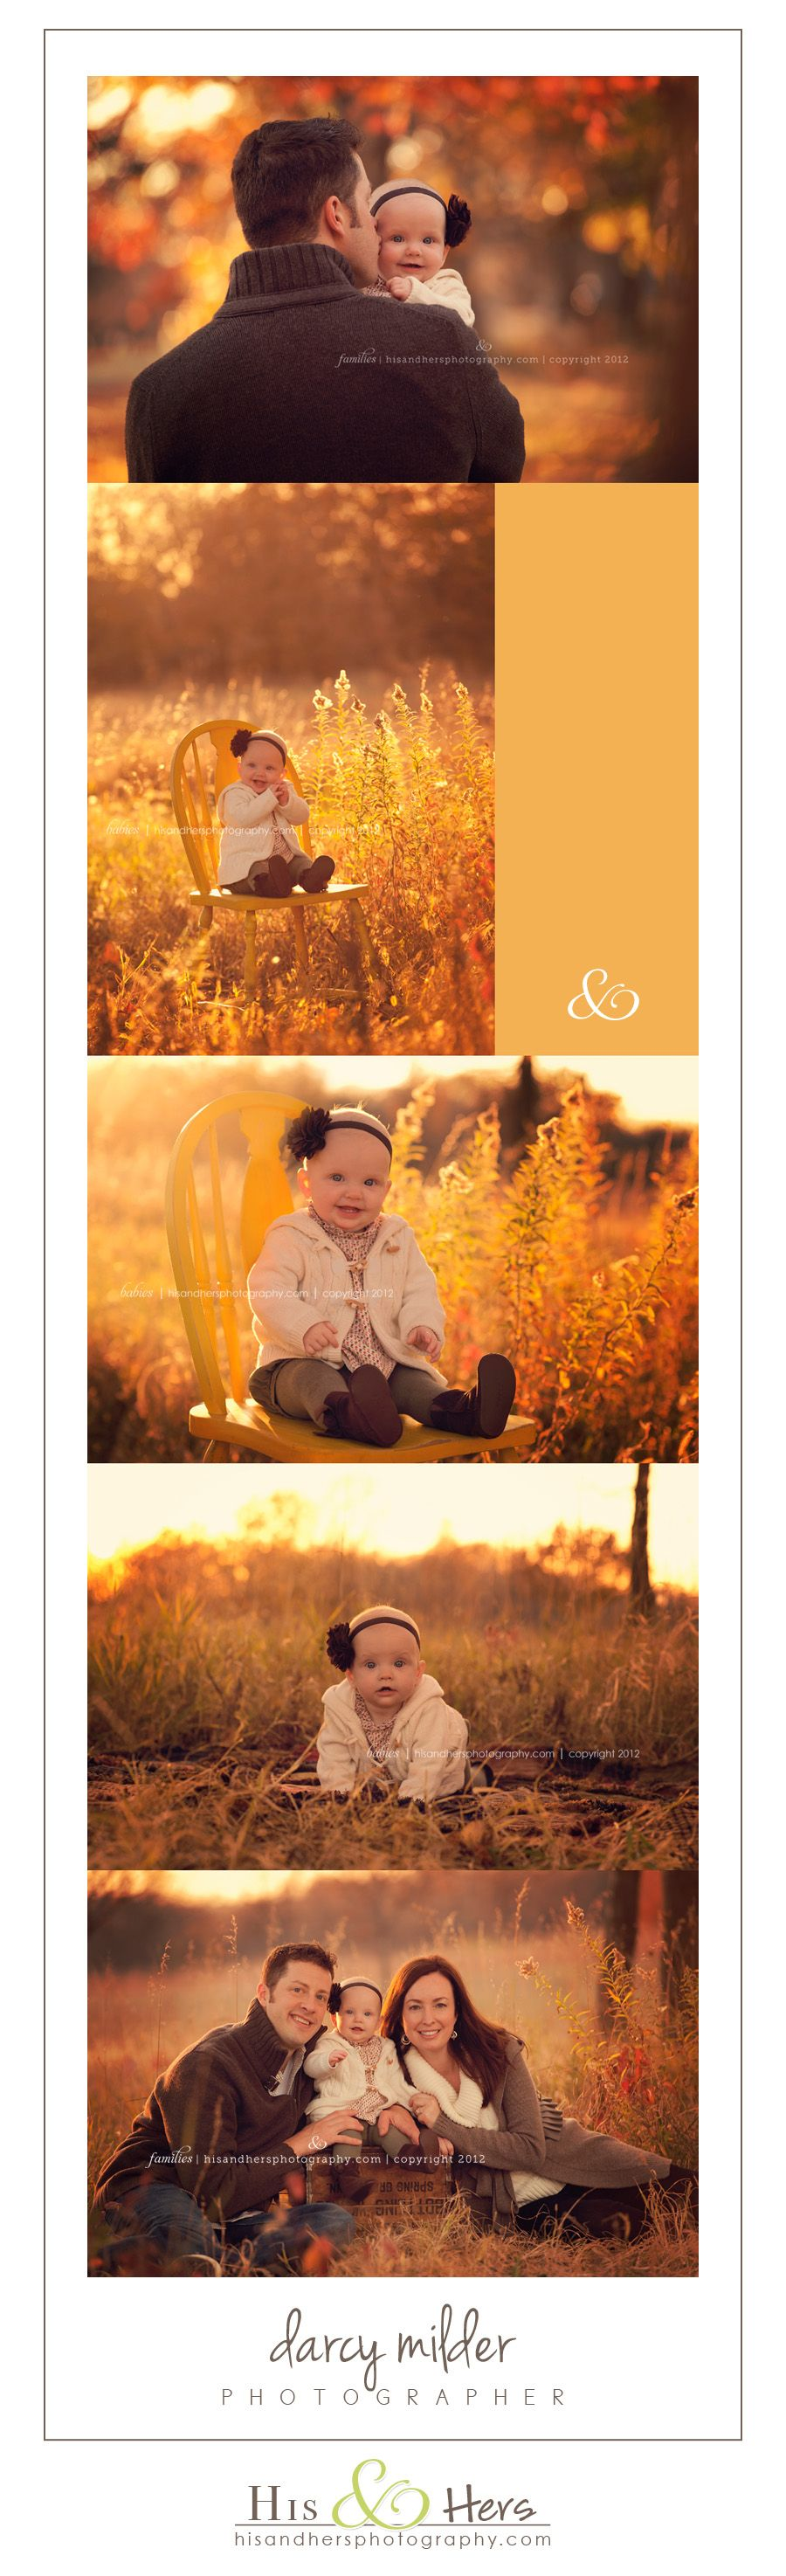 Iowa Children & Family Photographer | Charlotte 6 months old